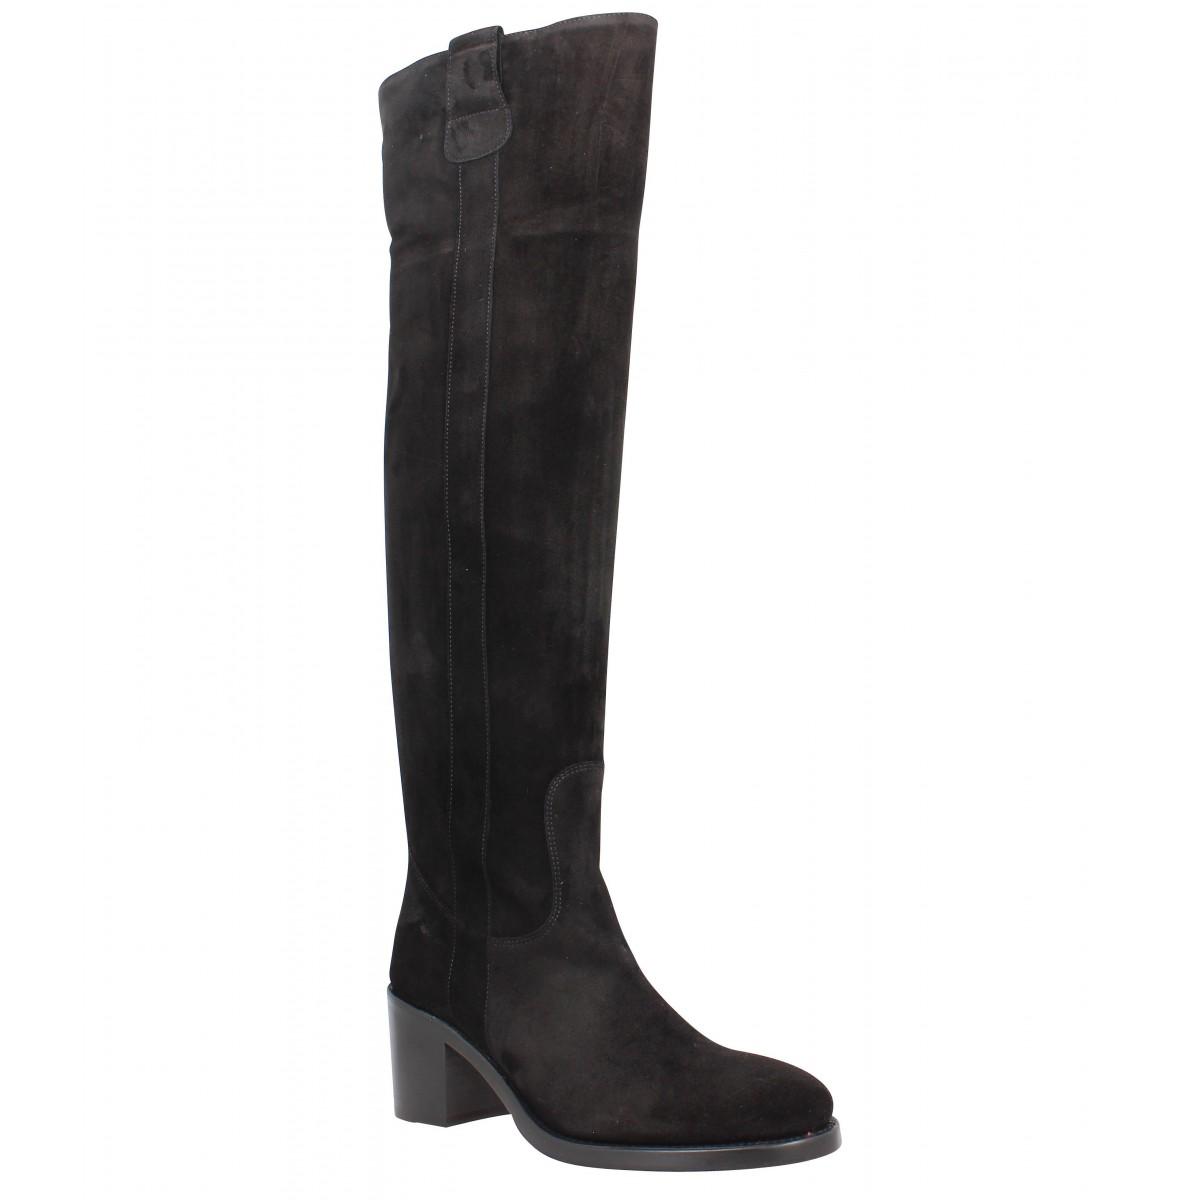 free lance mansory 7 genouillere velours femme noir femme fanny chaussures. Black Bedroom Furniture Sets. Home Design Ideas